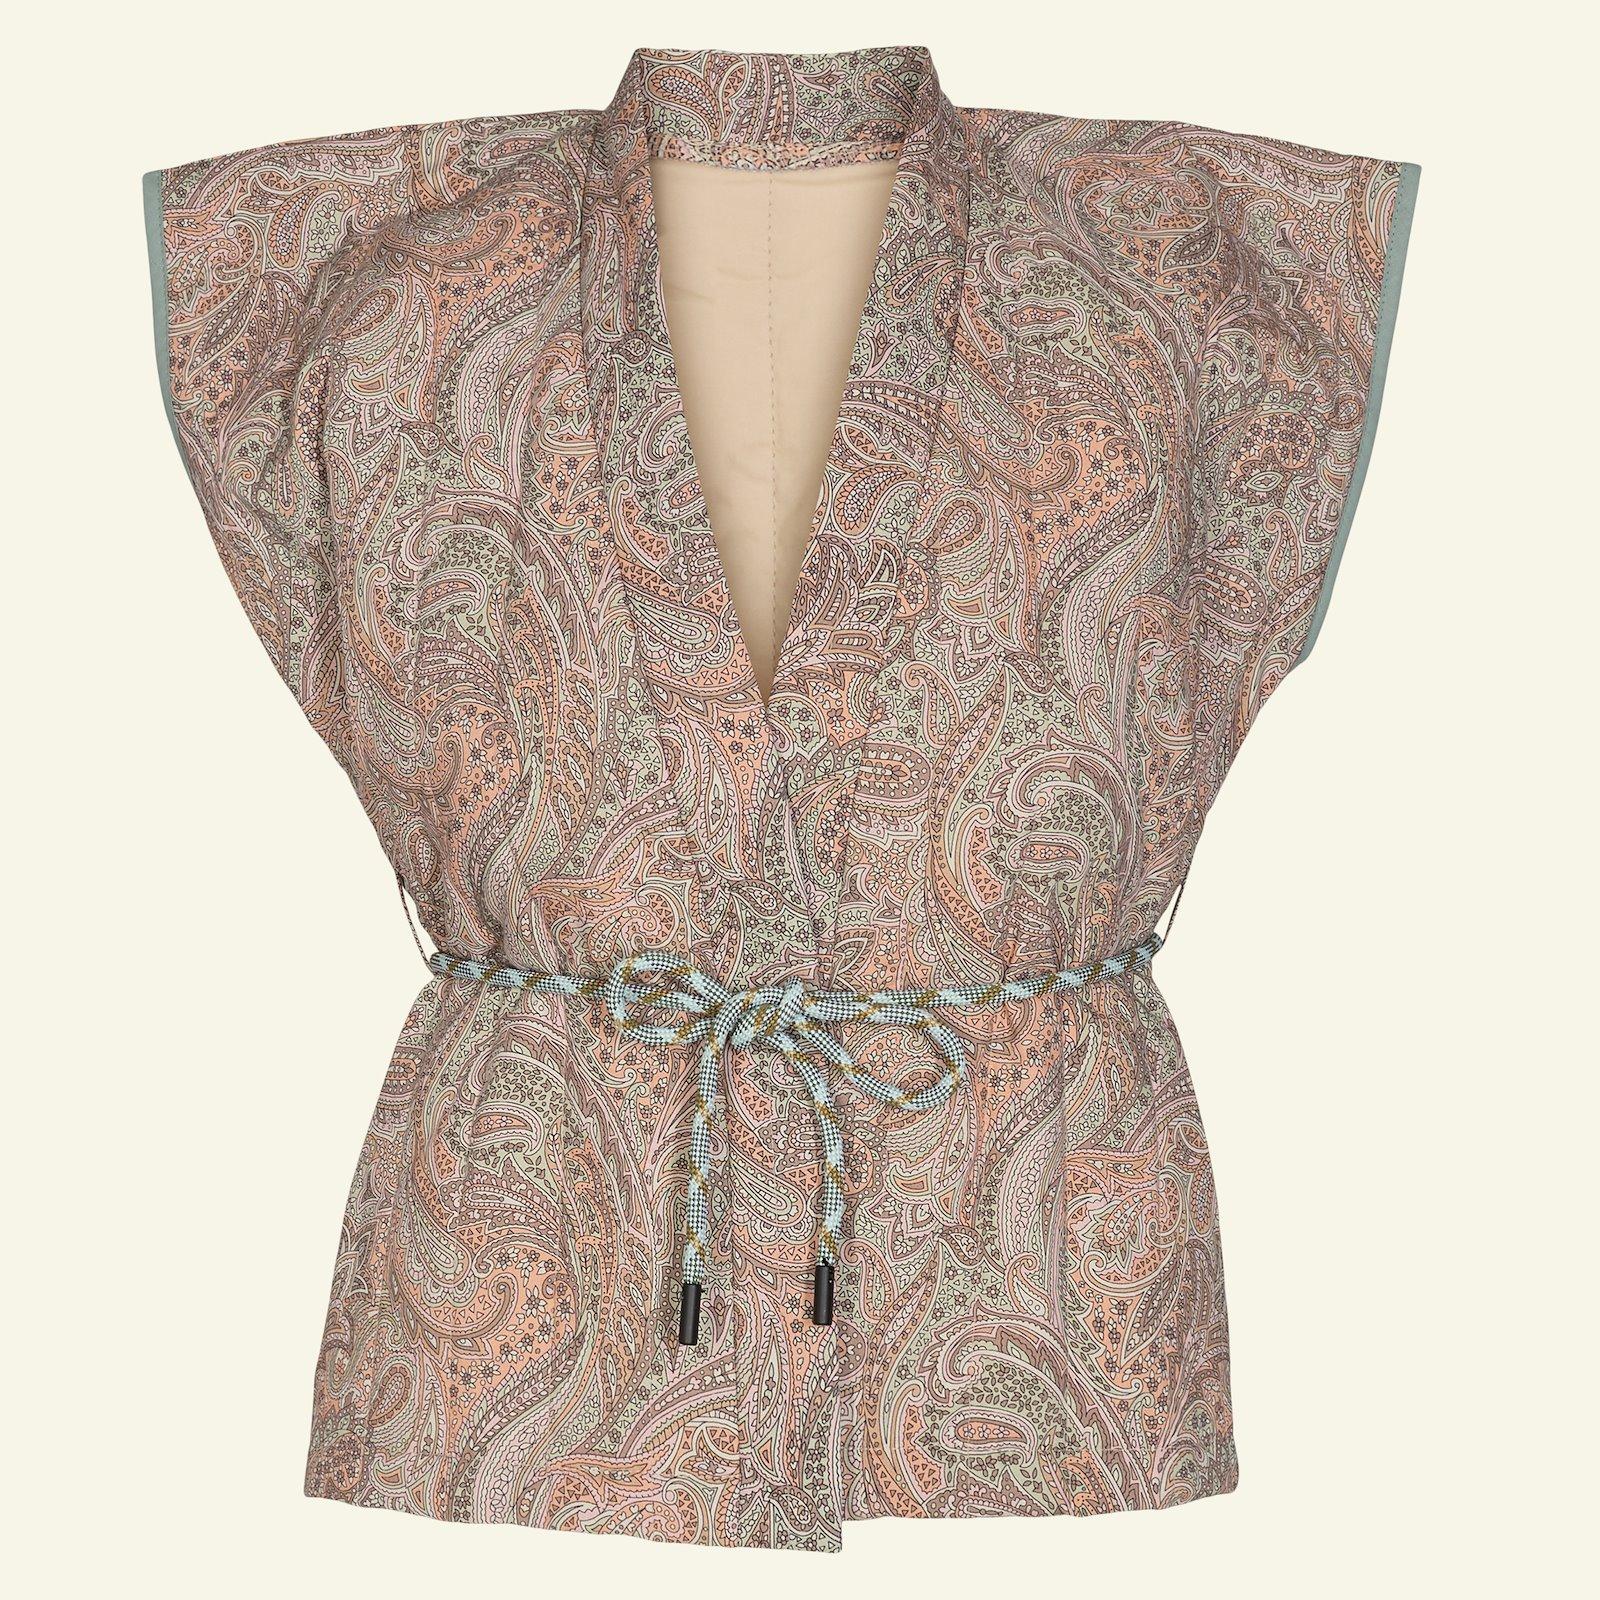 Kimono and tunika, 104/4y p63057_540116_540112_9500_66086_75092_sskit